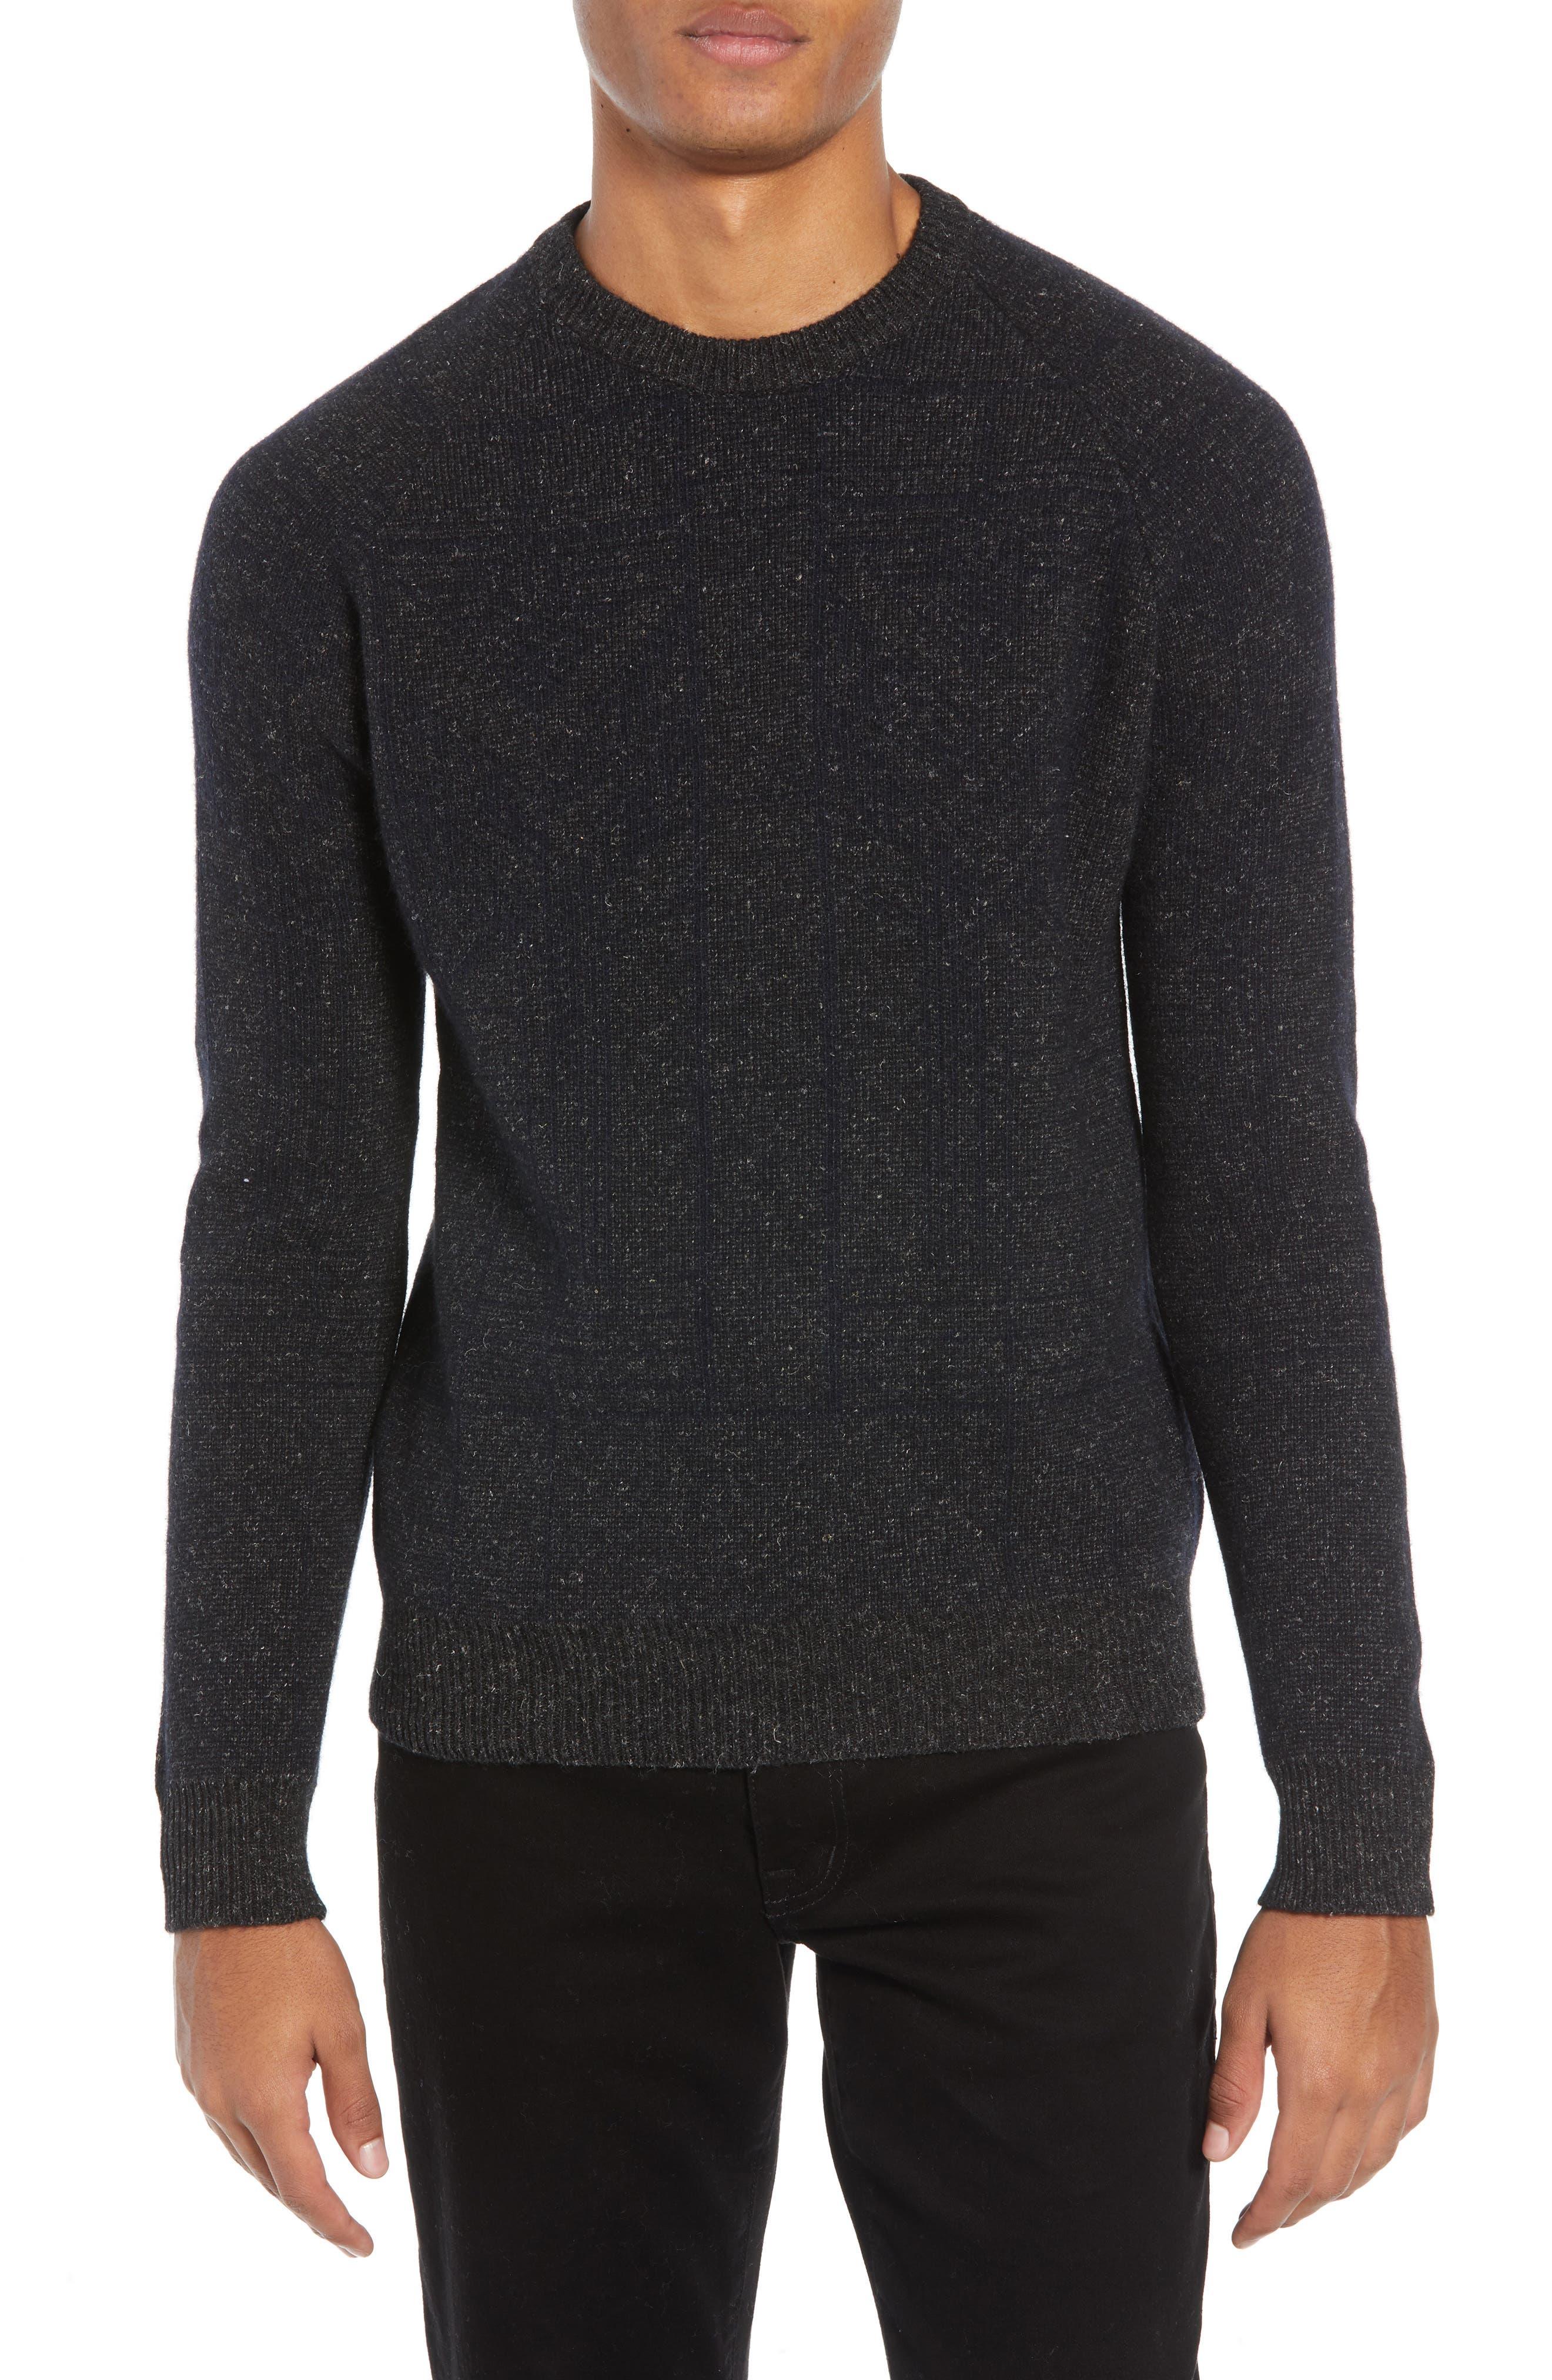 Regular Fit Crewneck Sweater,                         Main,                         color, CHARCOAL